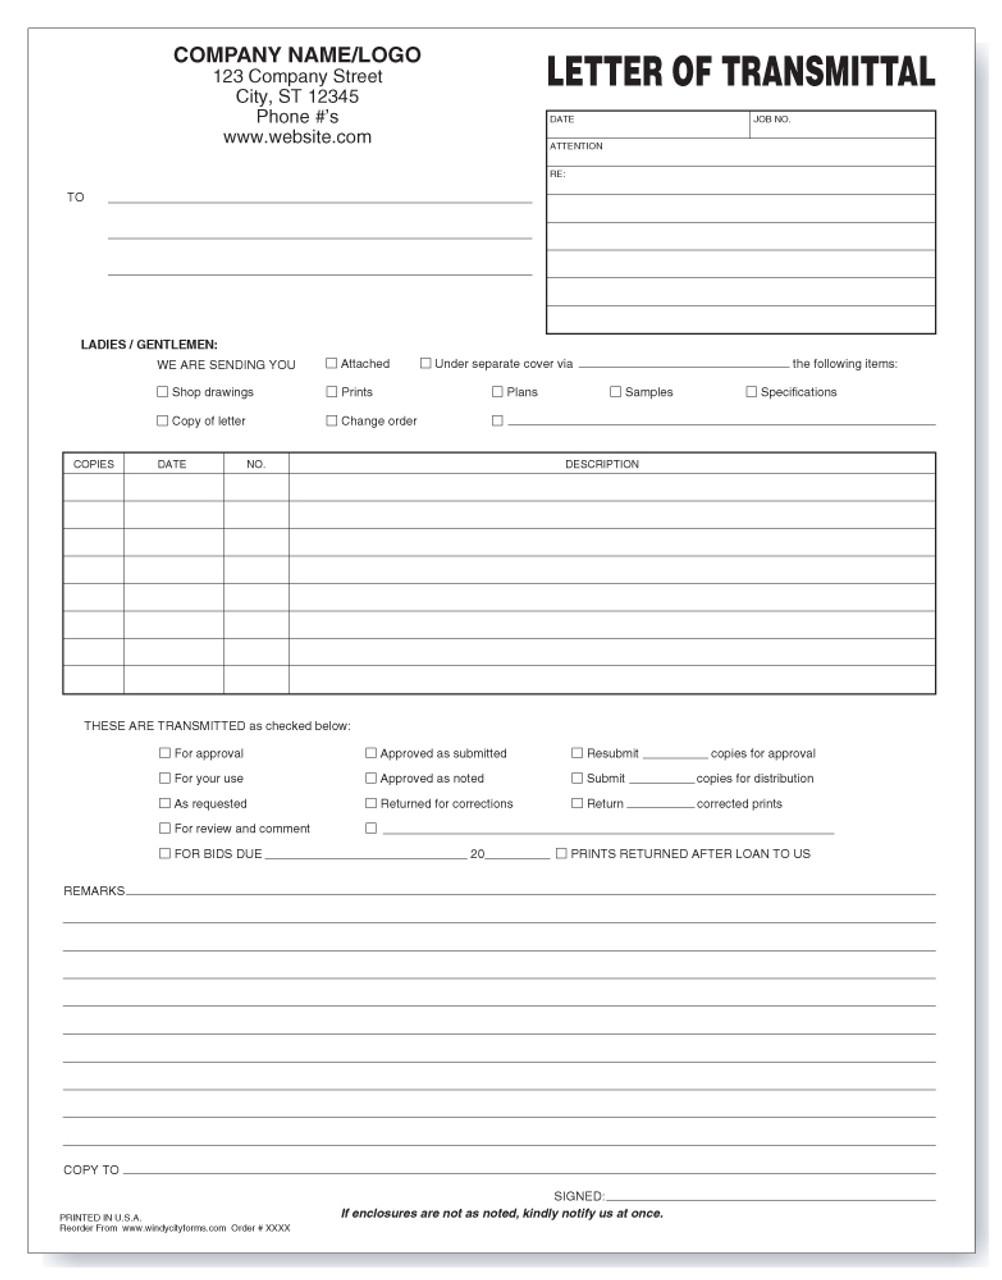 Letter Of Transmittal Template Doc from cdn11.bigcommerce.com